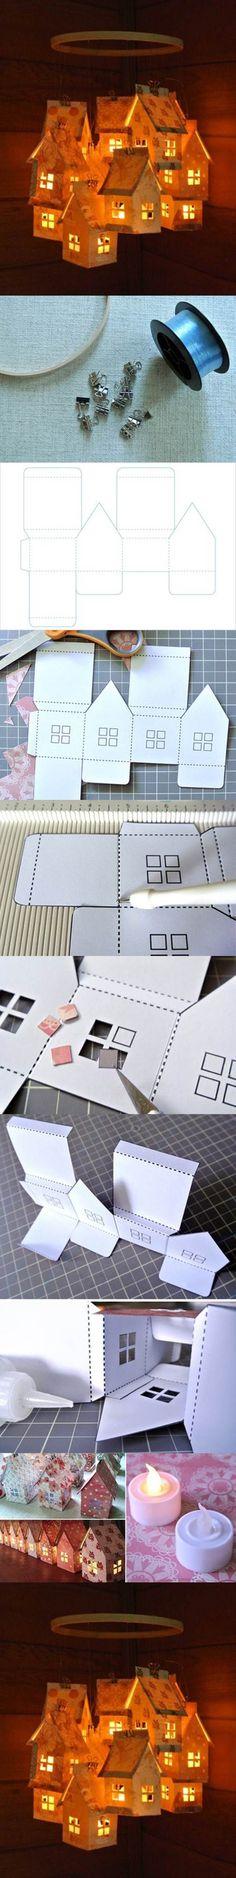 DIY Cardboard Small Village Shaped Lantern | iCreativeIdeas.com Like Us on Facebook ==> https://www.facebook.com/icreativeideas: